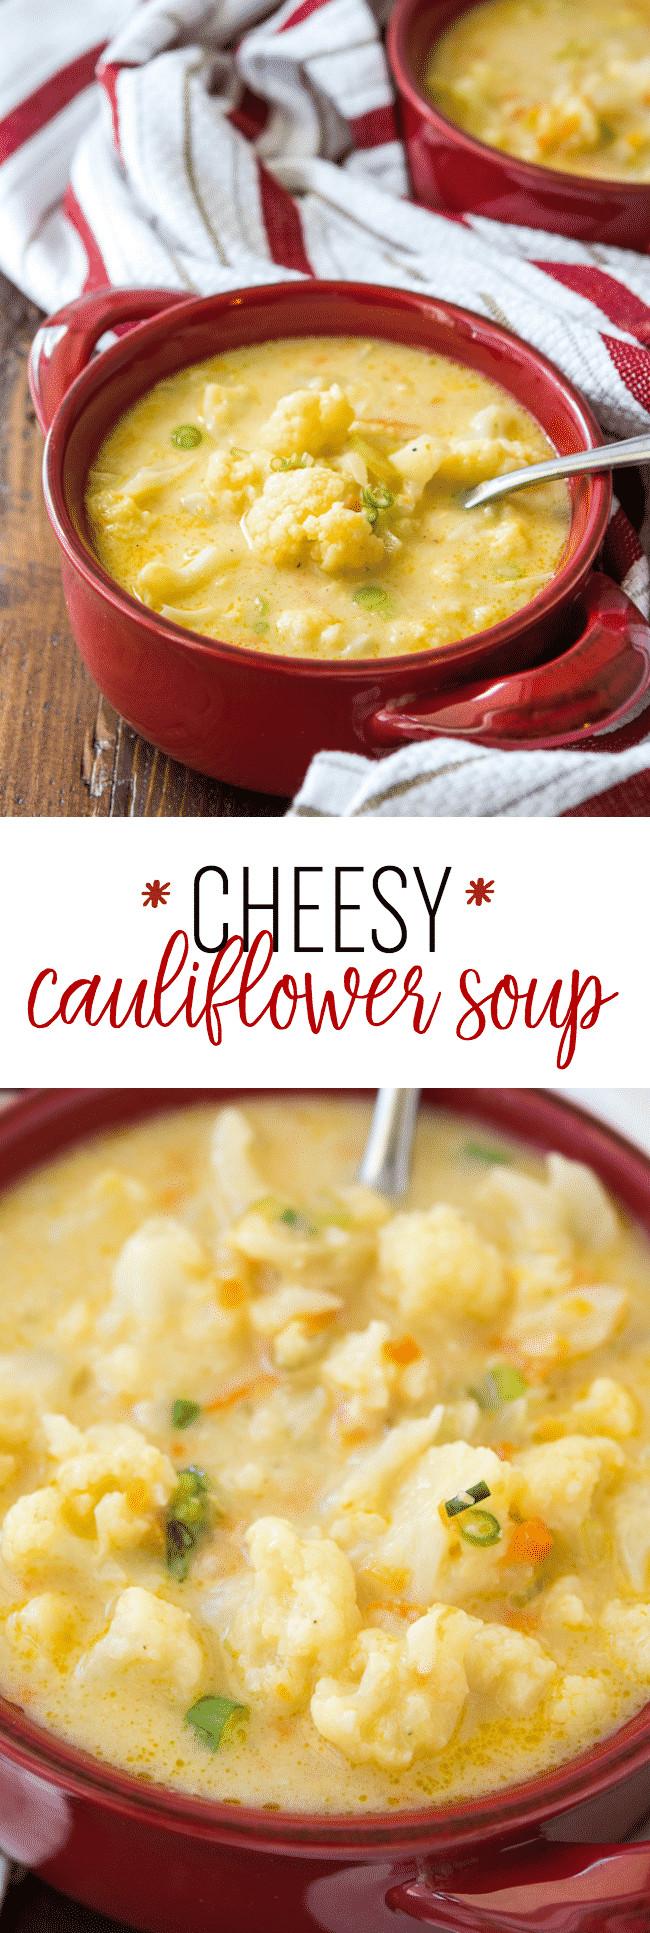 Cheesy Cauliflower Soup  Cheesy Cauliflower Soup Dear Crissy howlDb